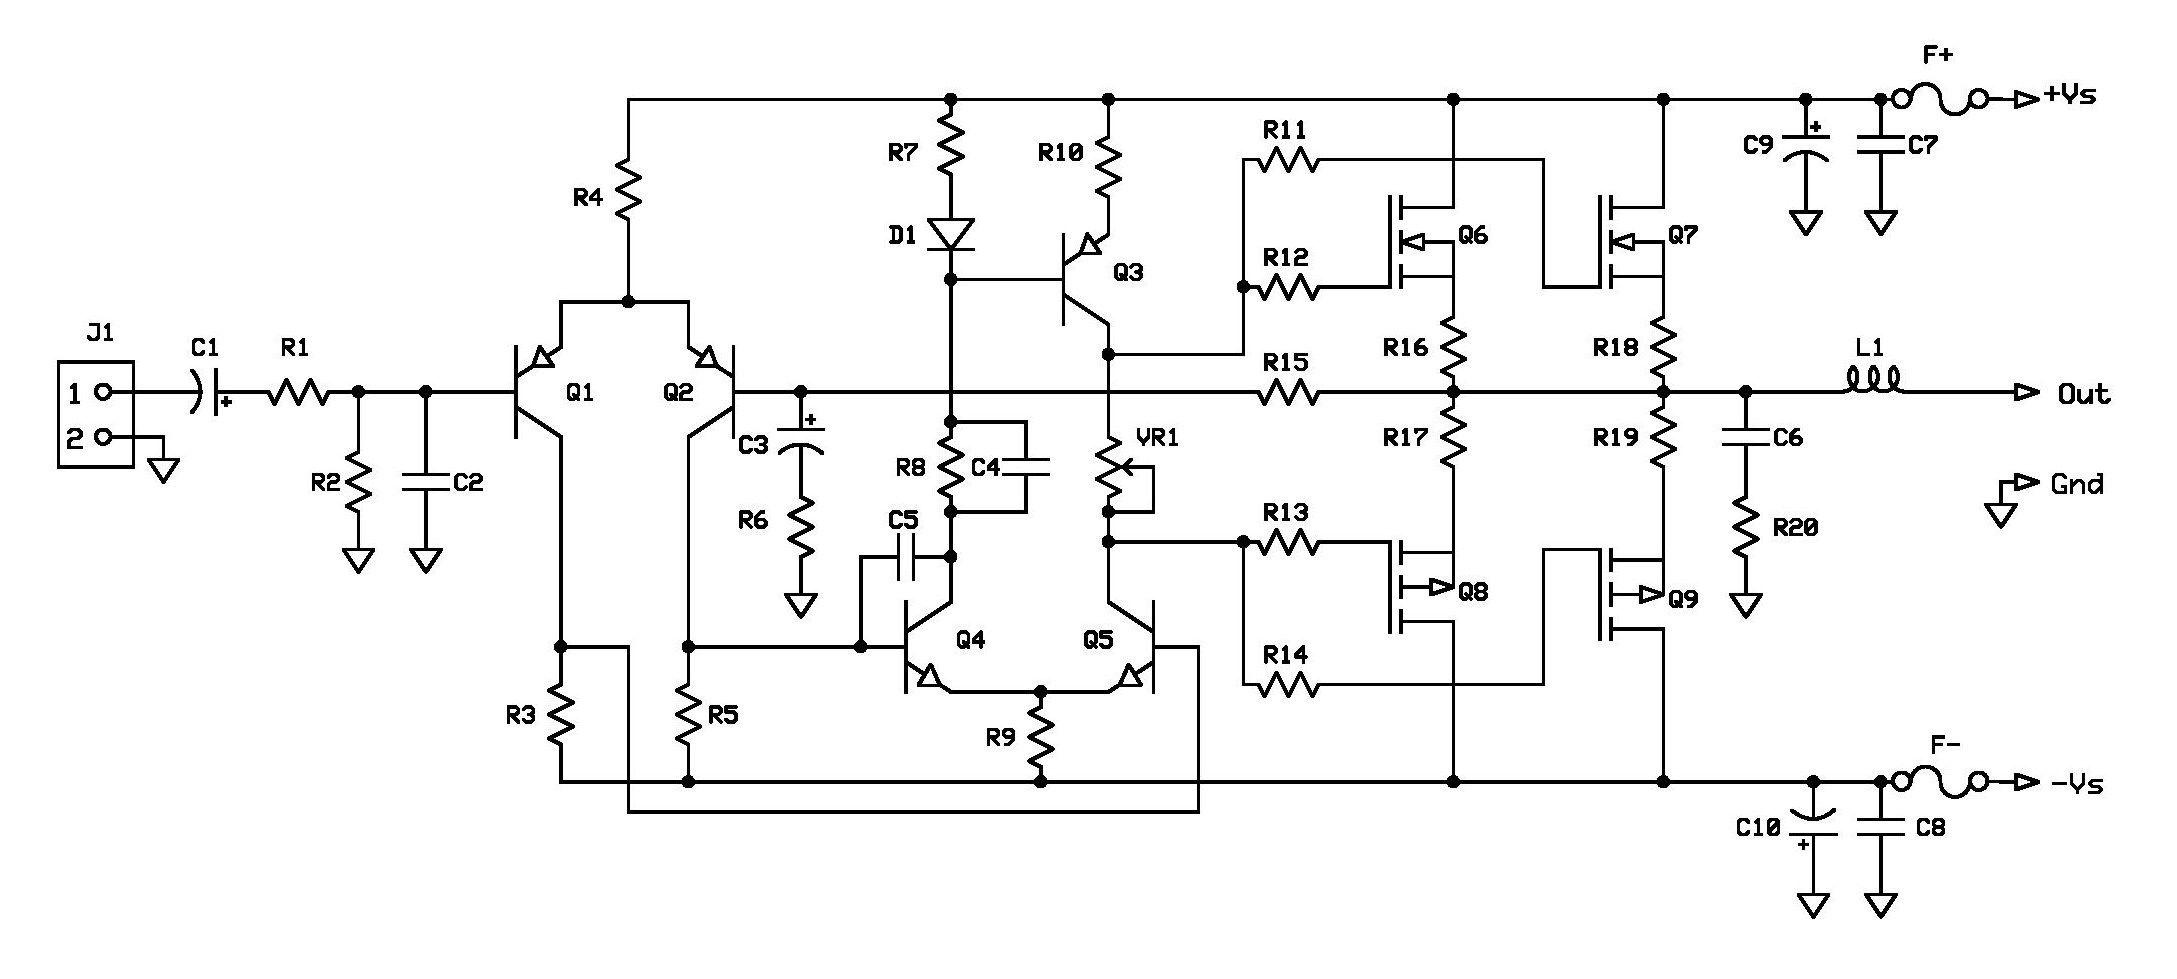 Mosfet Amplifier Schematic Diagram Wiring Will Be A Thing 600 Watt Power Circuit Circuits Anfi Pinterest Rh Com